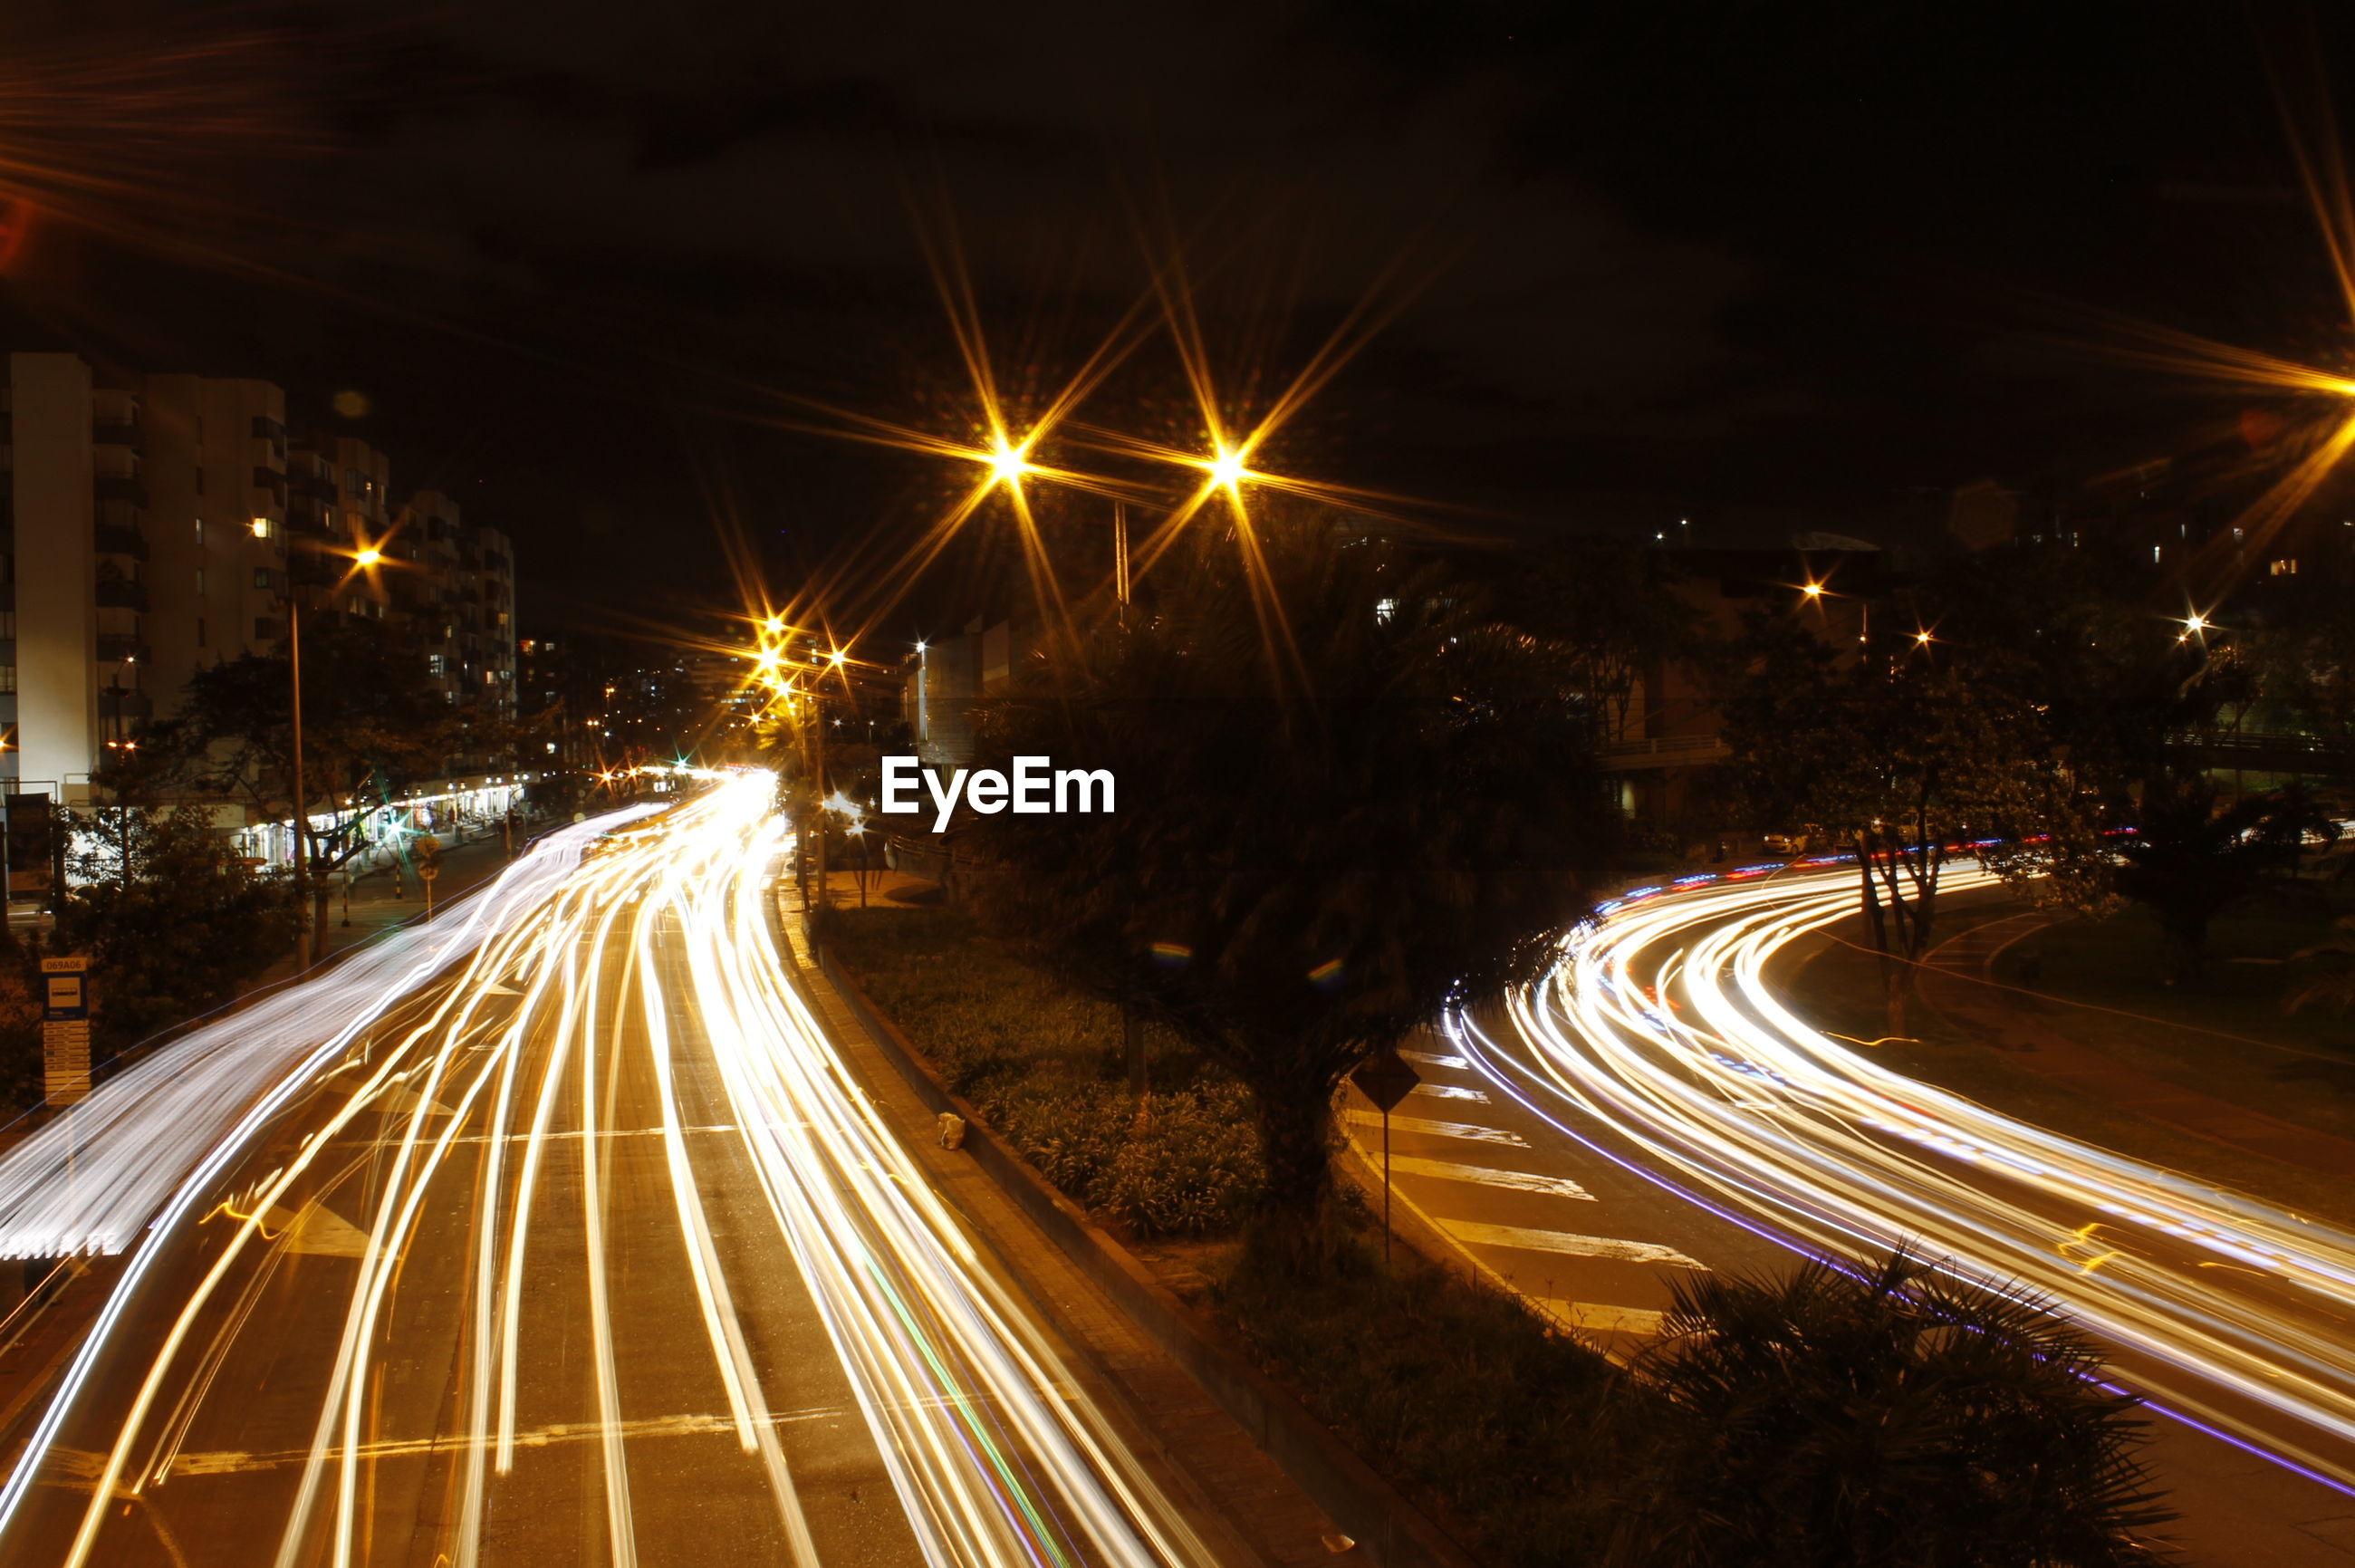 LIGHT TRAILS ON ROAD ALONG ILLUMINATED STREET LIGHTS